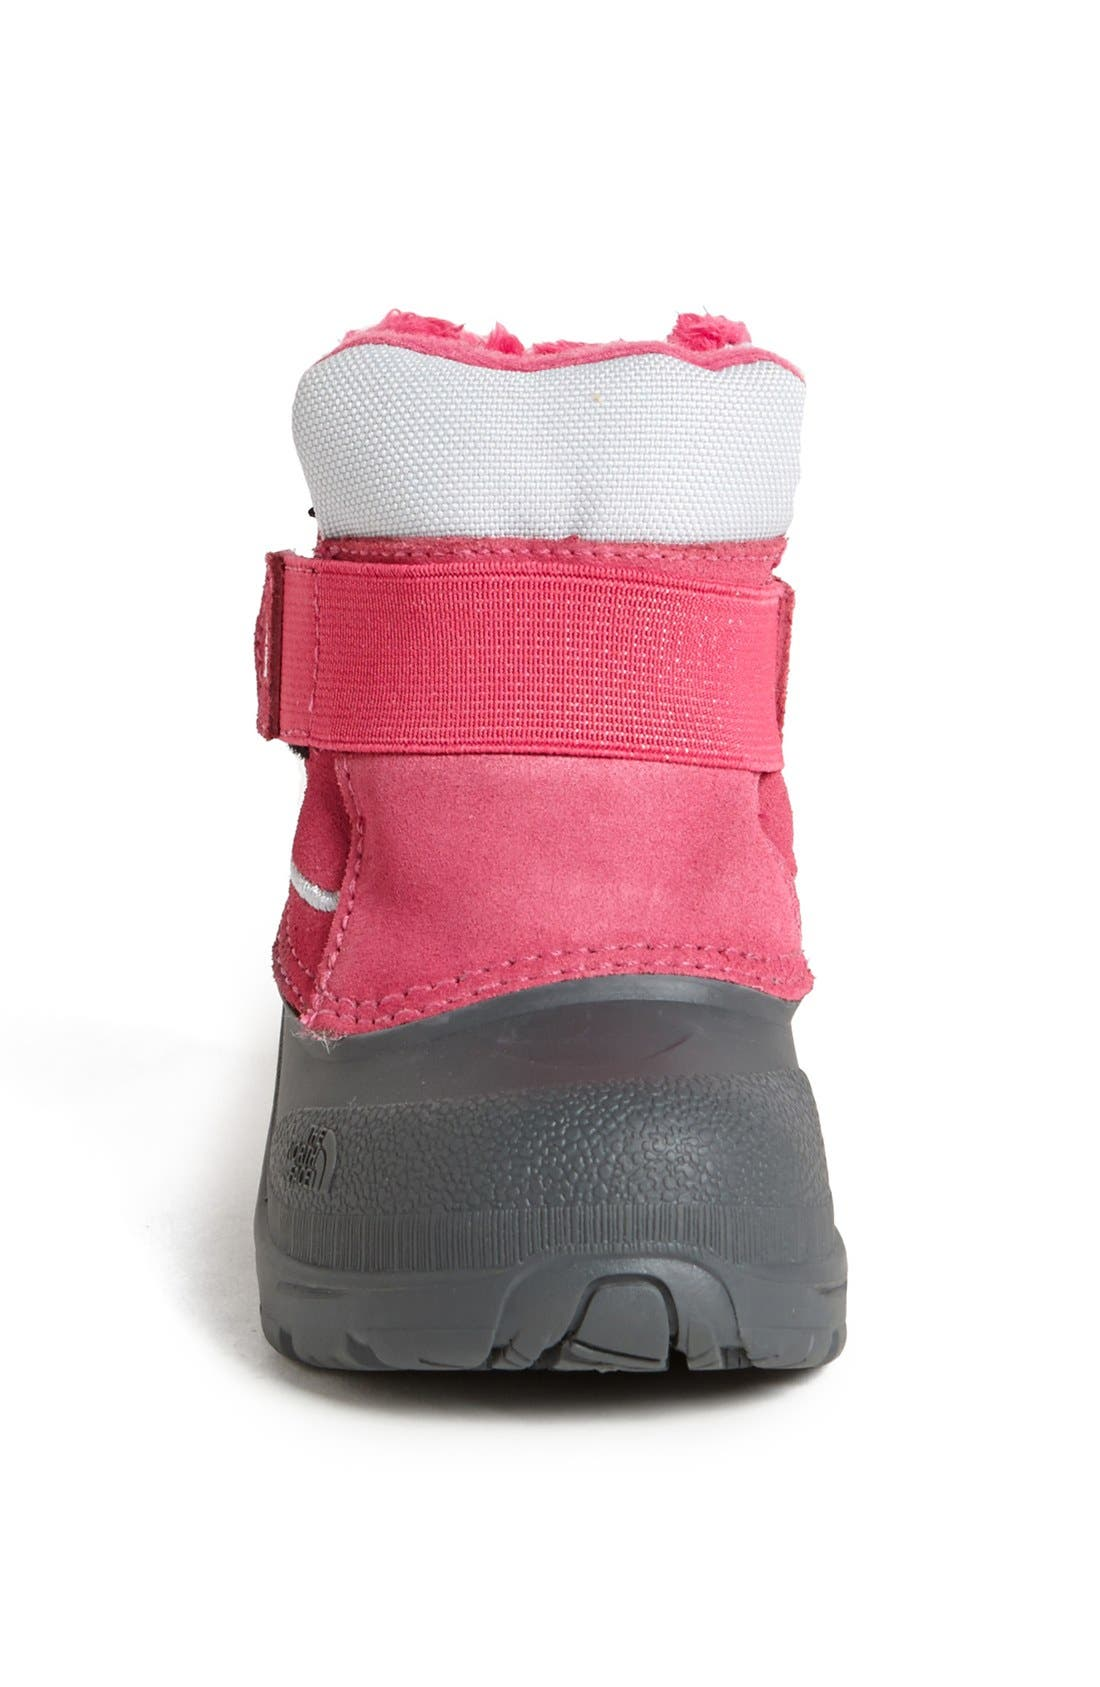 Alternate Image 3  - The North Face 'Powder Hound' Waterproof Snow Boot (Walker & Toddler)